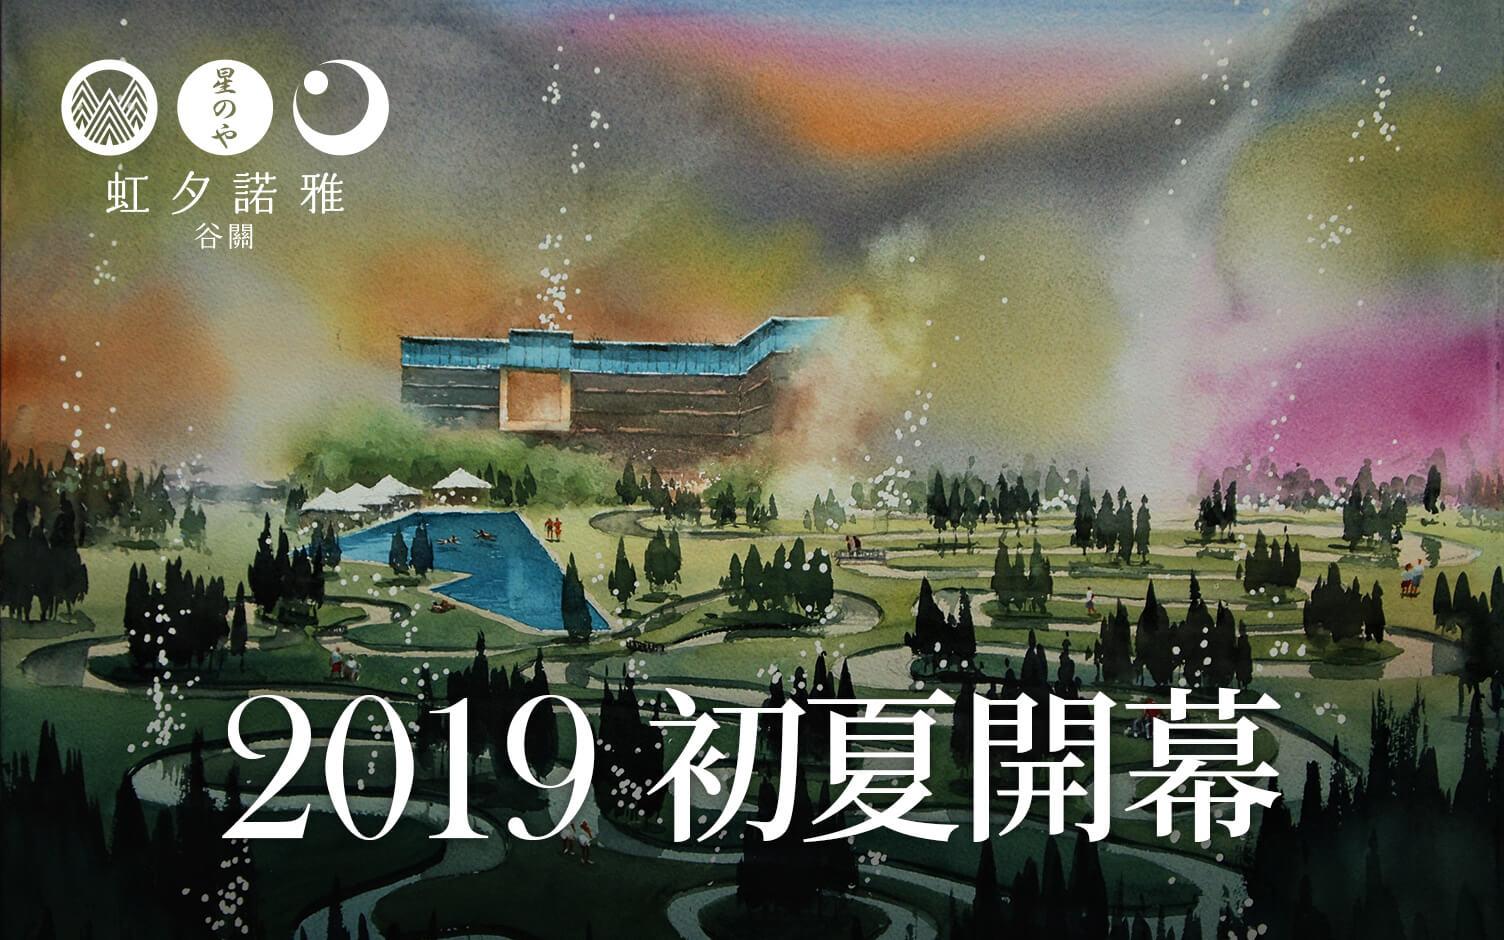 HOSHINOYA Guguan opens in early summer 2019